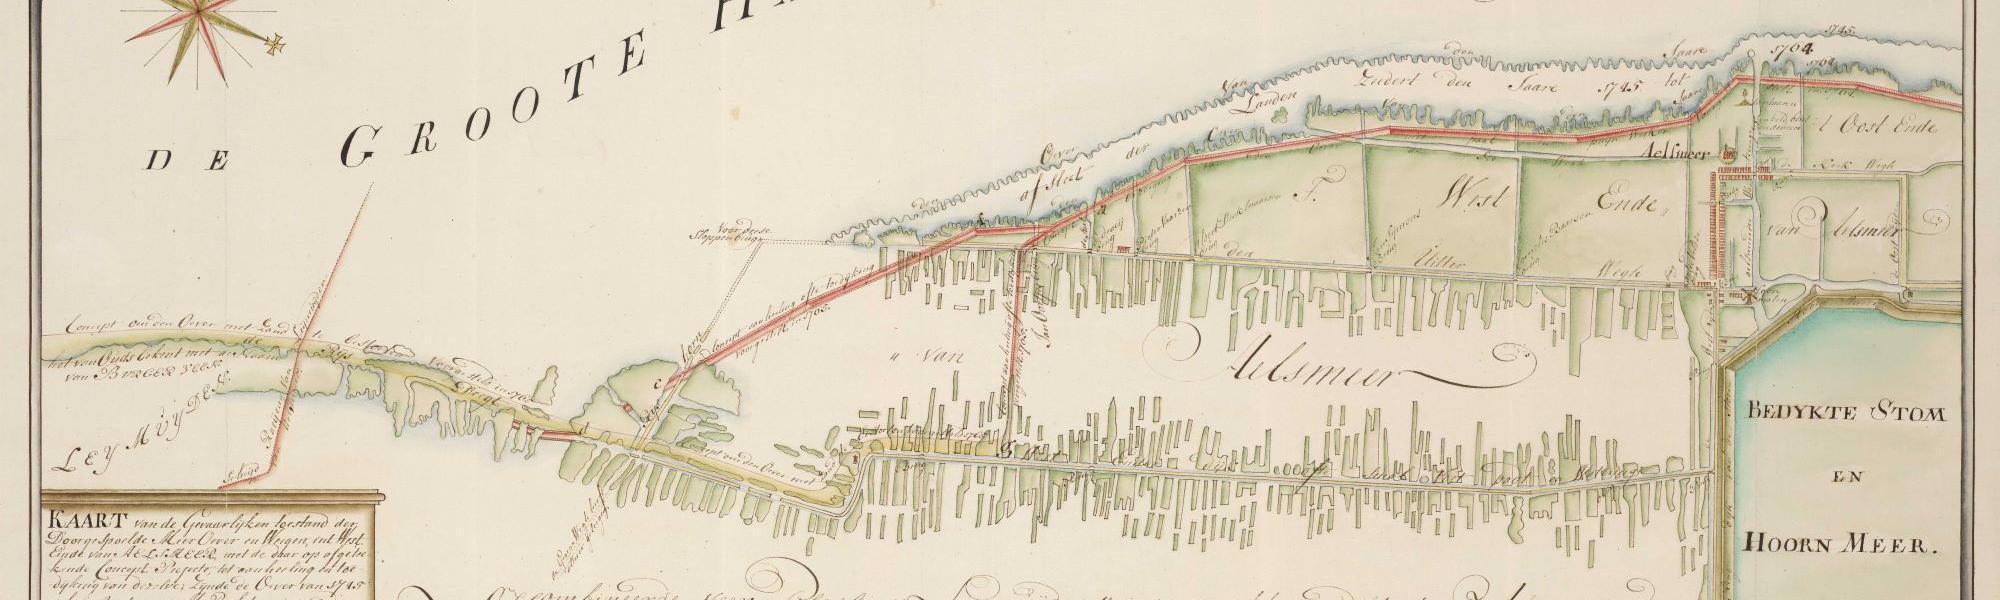 Westeinde kaart